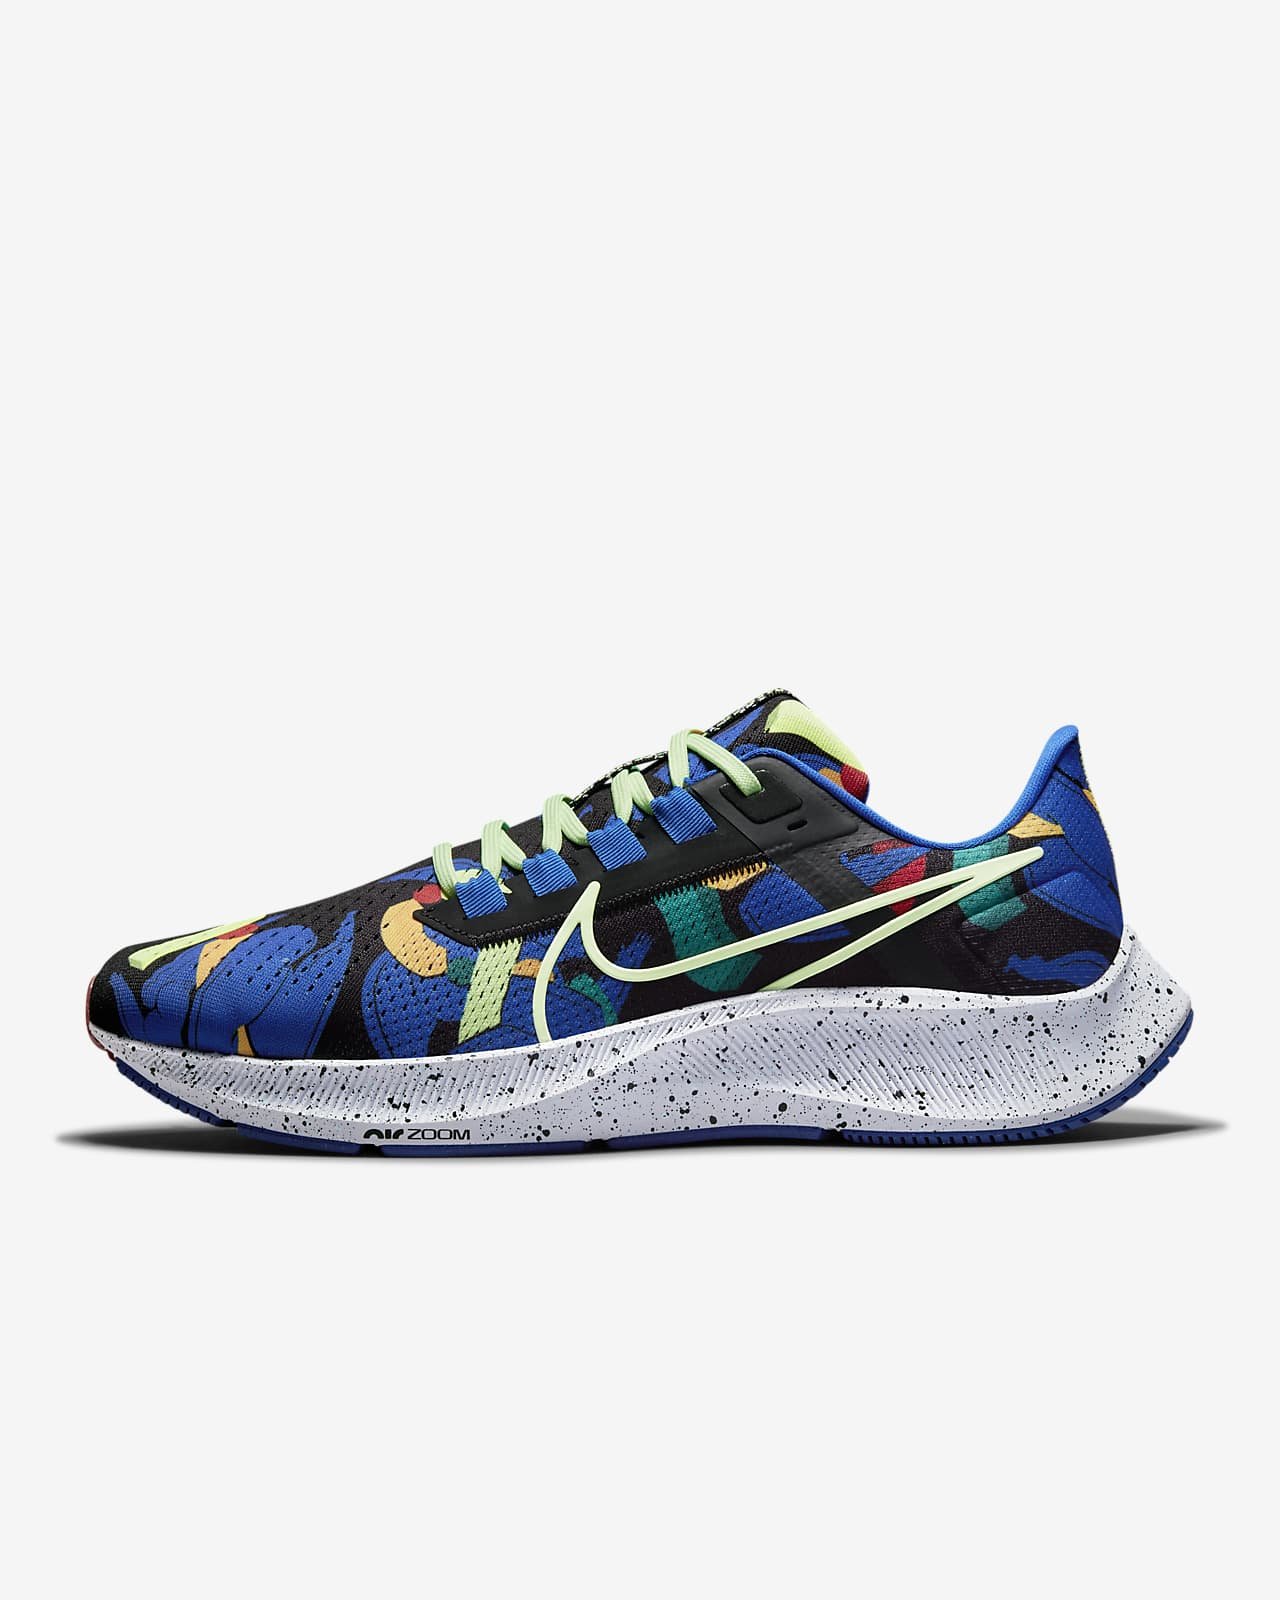 Nike Air Zoom Pegasus 38 A.I.R.Chaussure de running sur route Kelly Anna London pour Homme